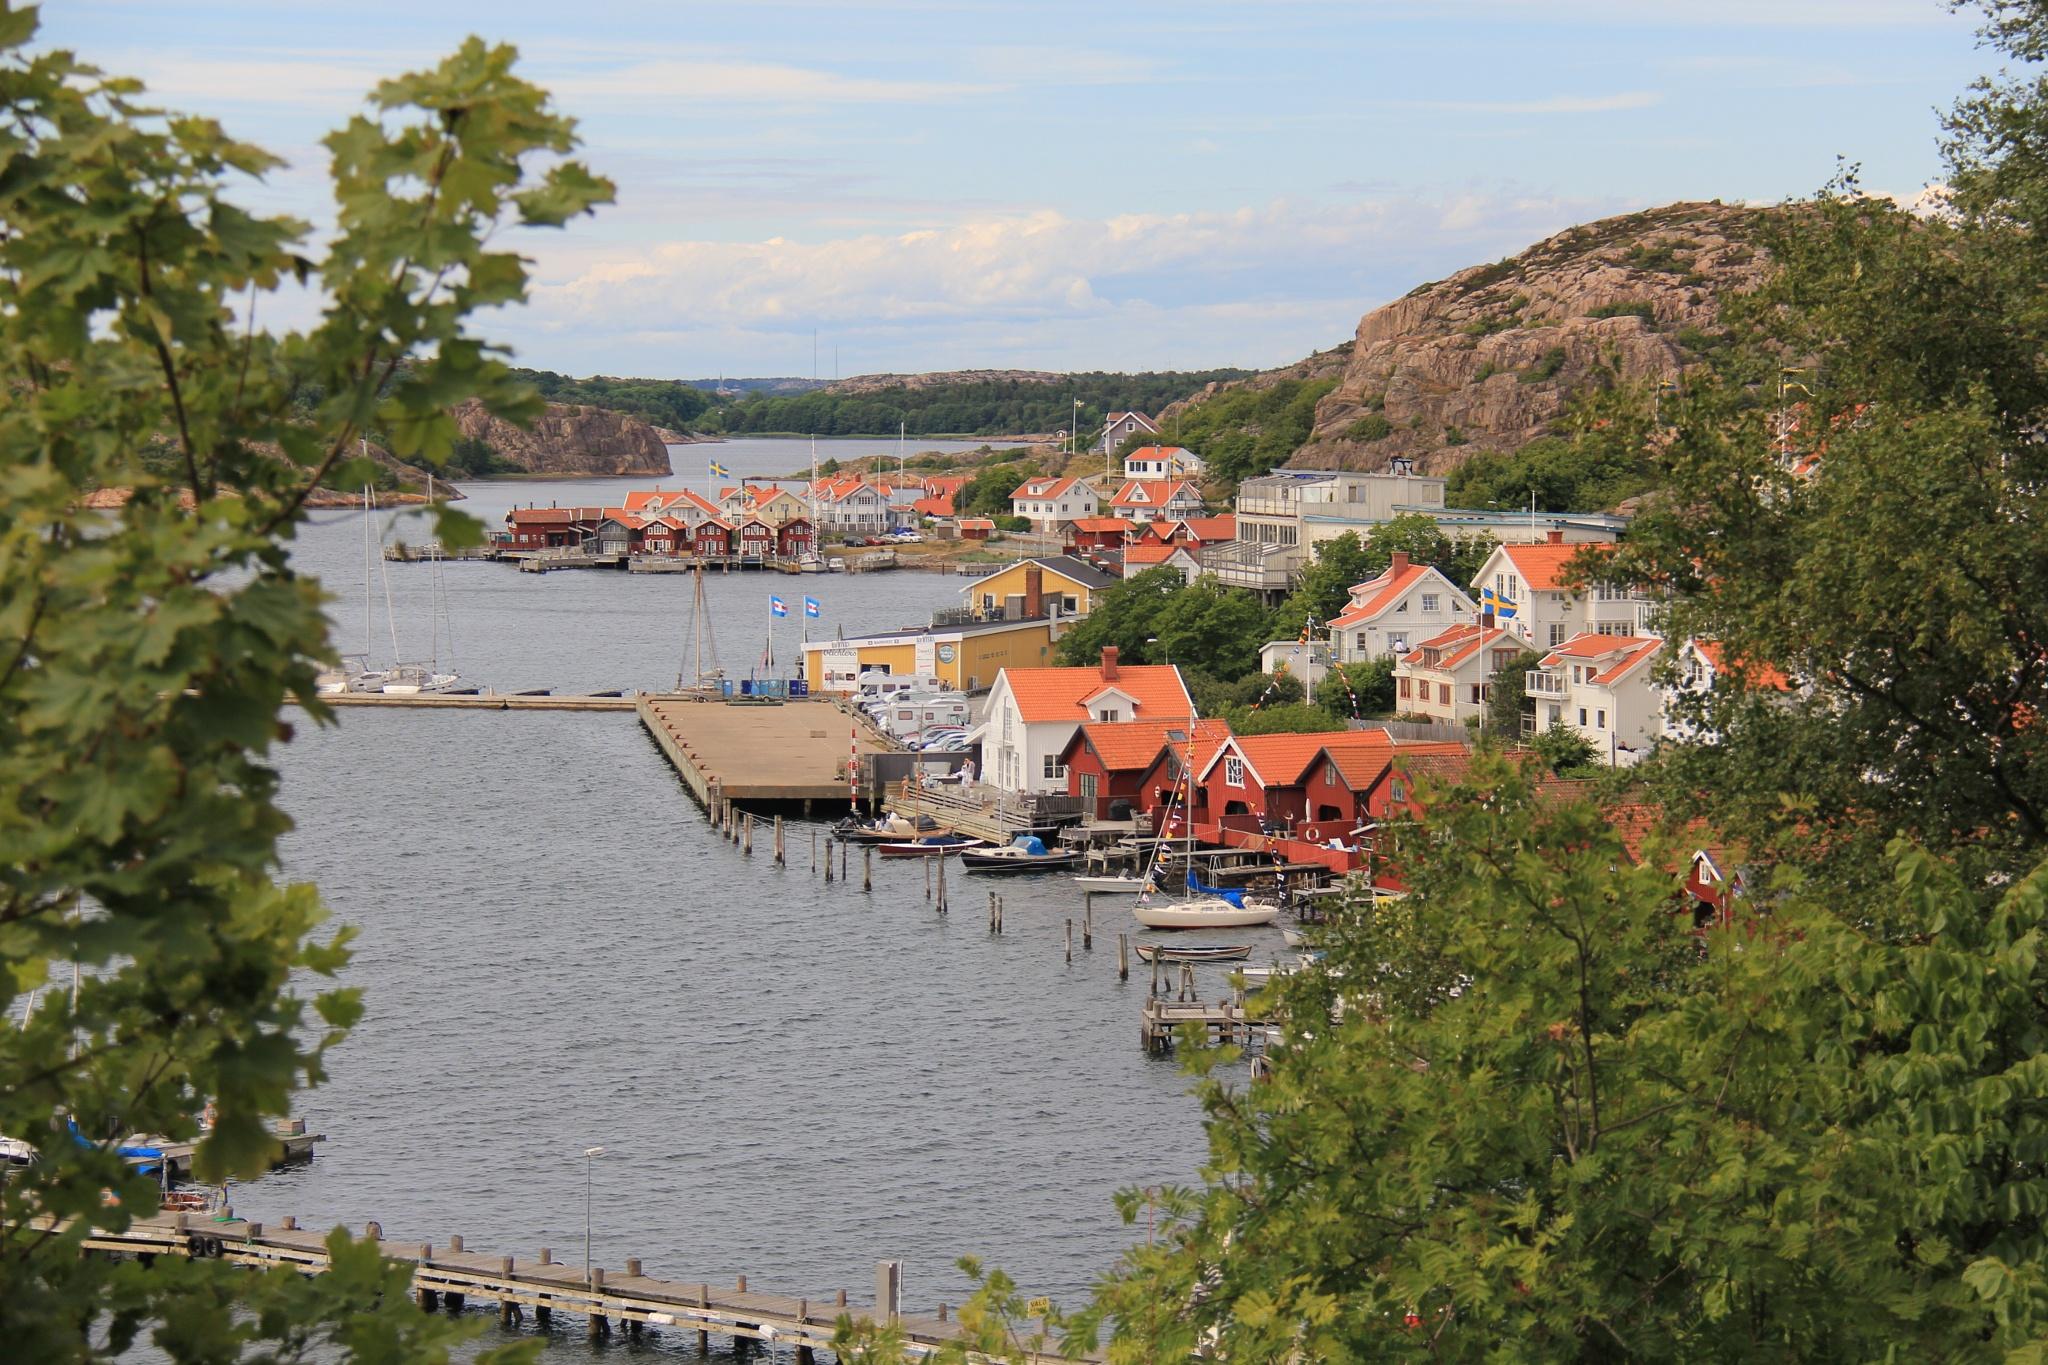 Fjallbacka Sweden by DavidABrown